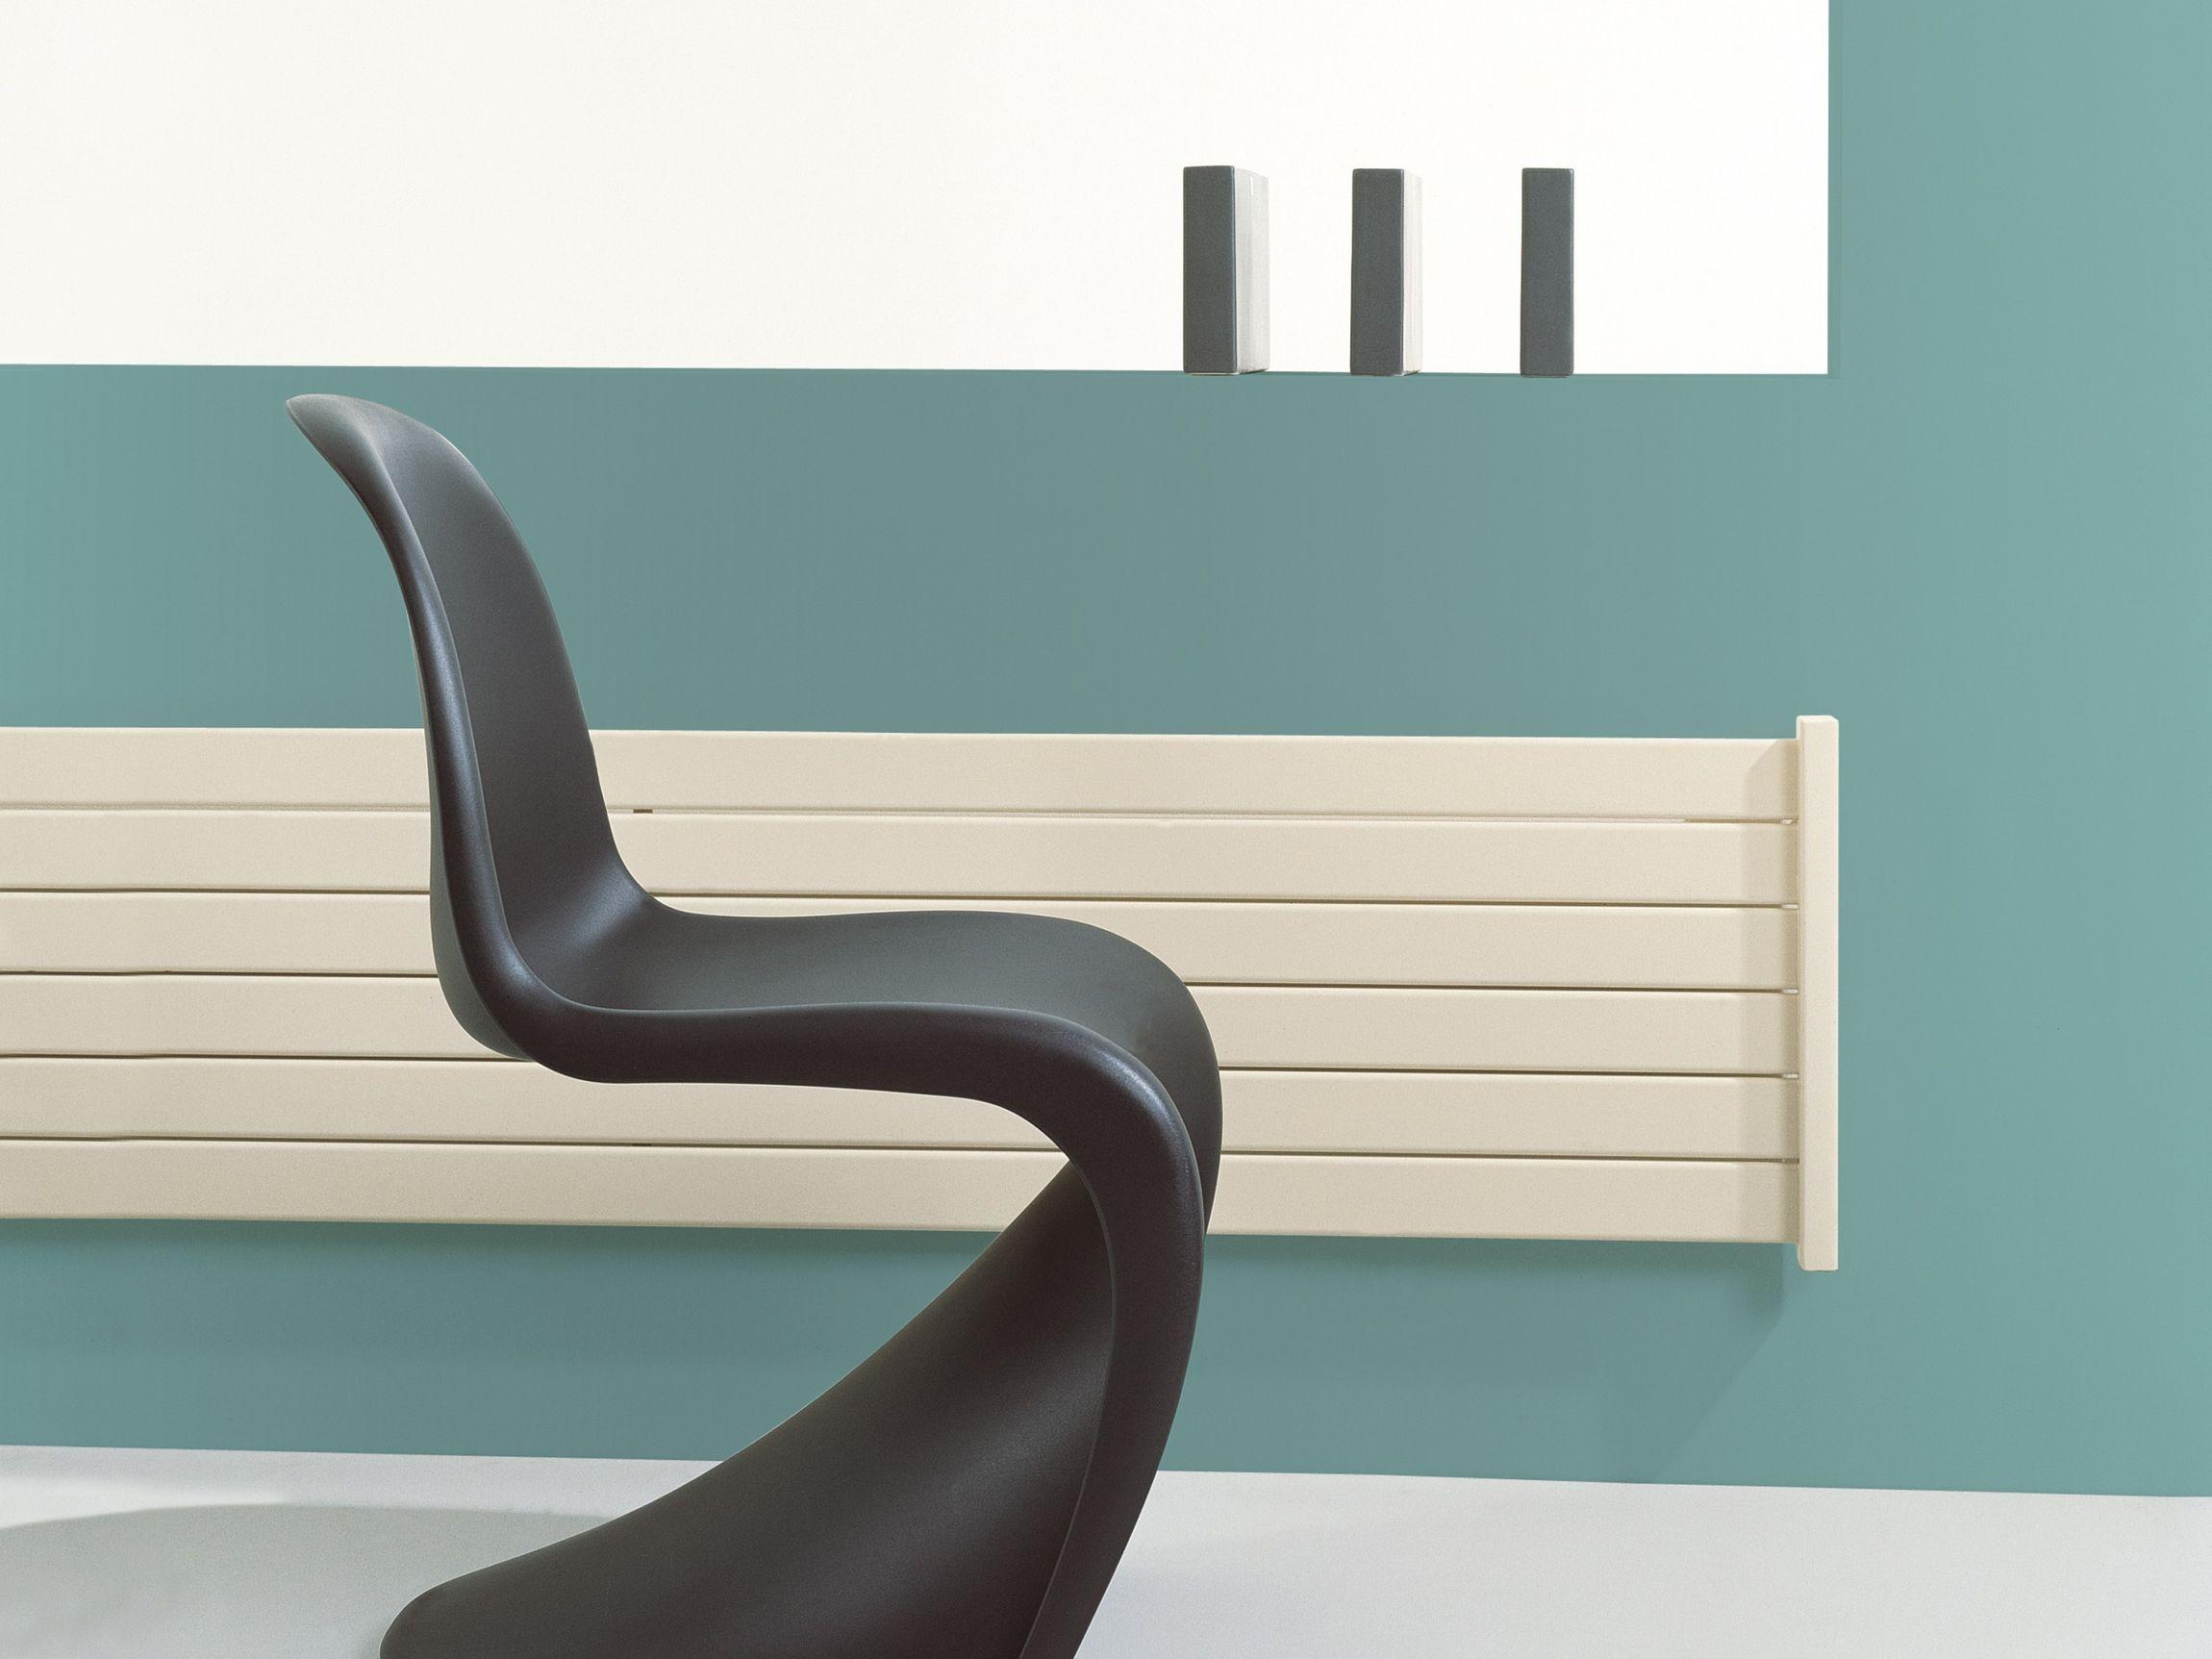 paneelheizk rper 66 x 7 x ab 100 cm ab 705 watt heizk rper heizk rper paneel paneelheizk rper. Black Bedroom Furniture Sets. Home Design Ideas